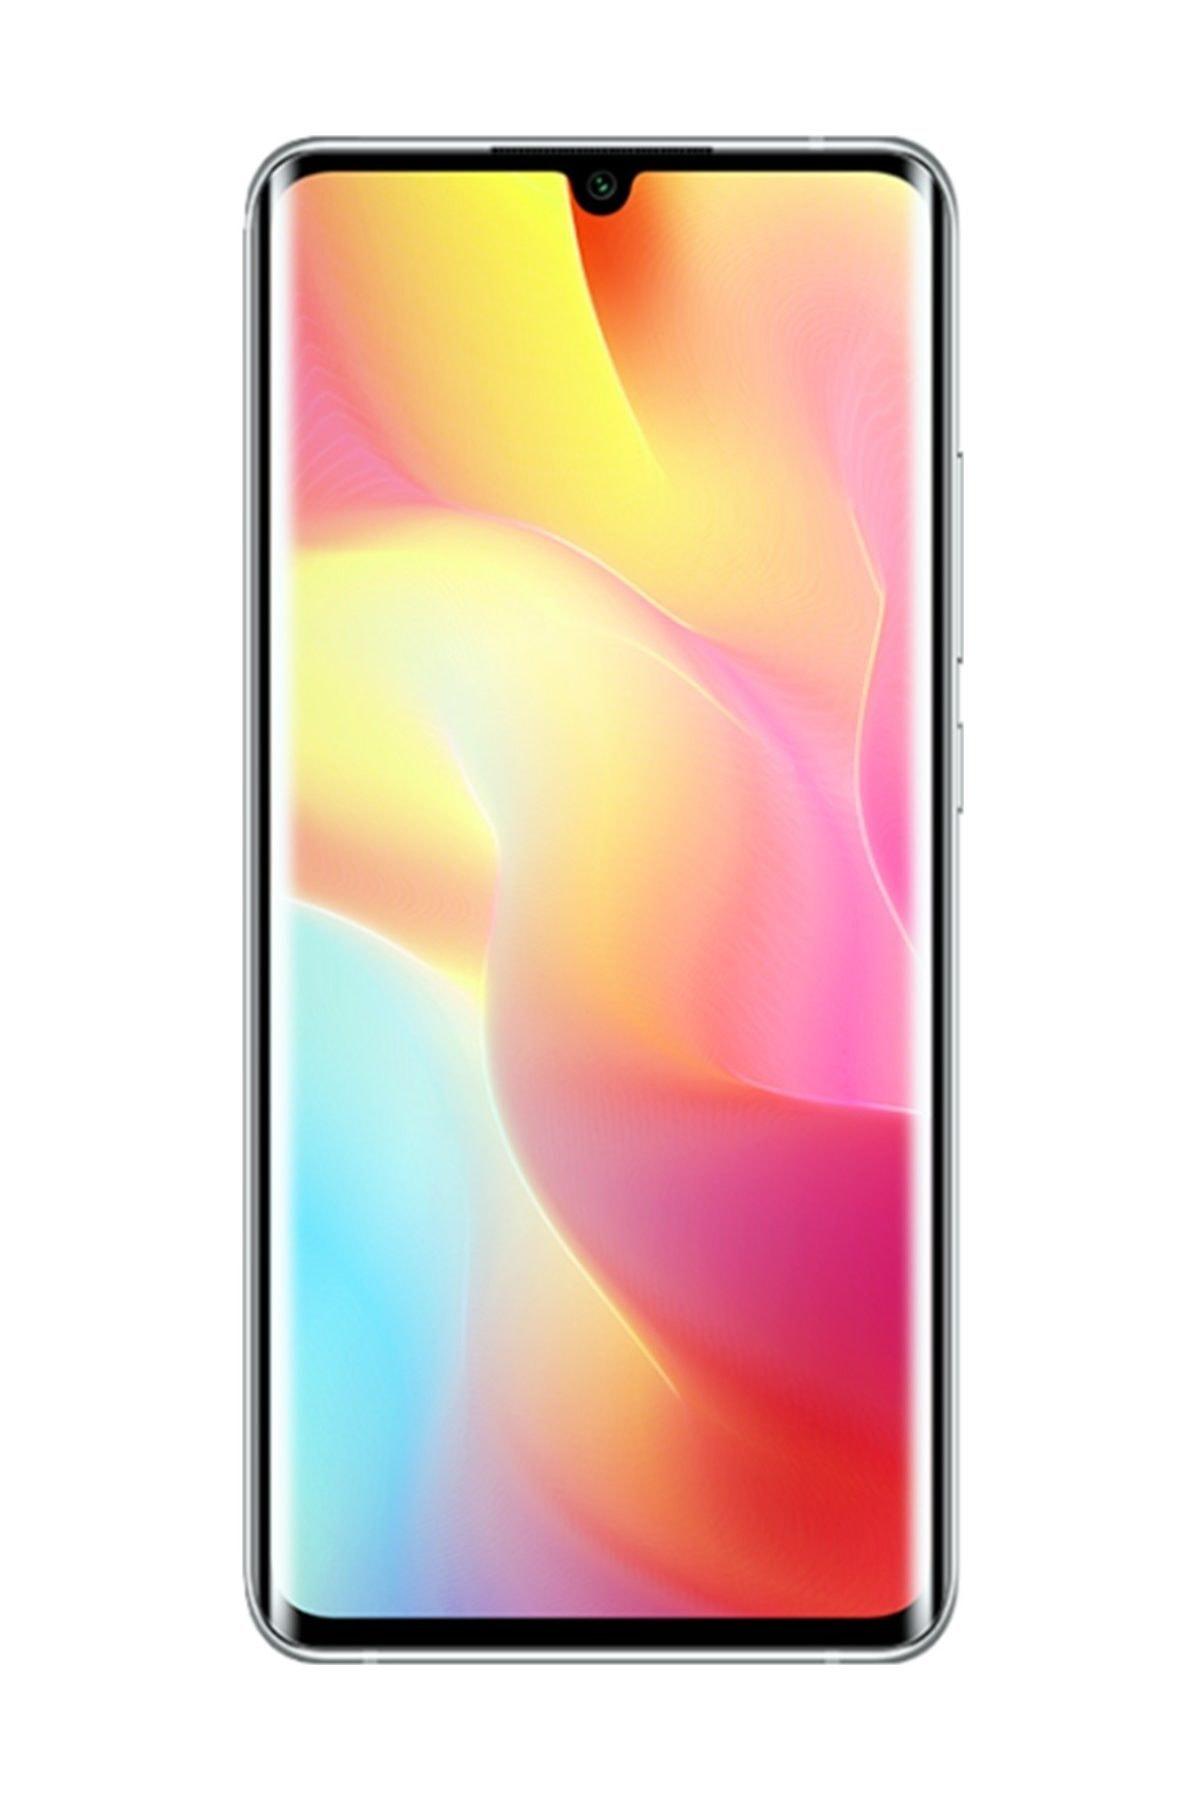 Xiaomi Mi Note 10 Lite 64GB Siyah Cep Telefonu (Xiaomi Türkiye Garantiili) 1